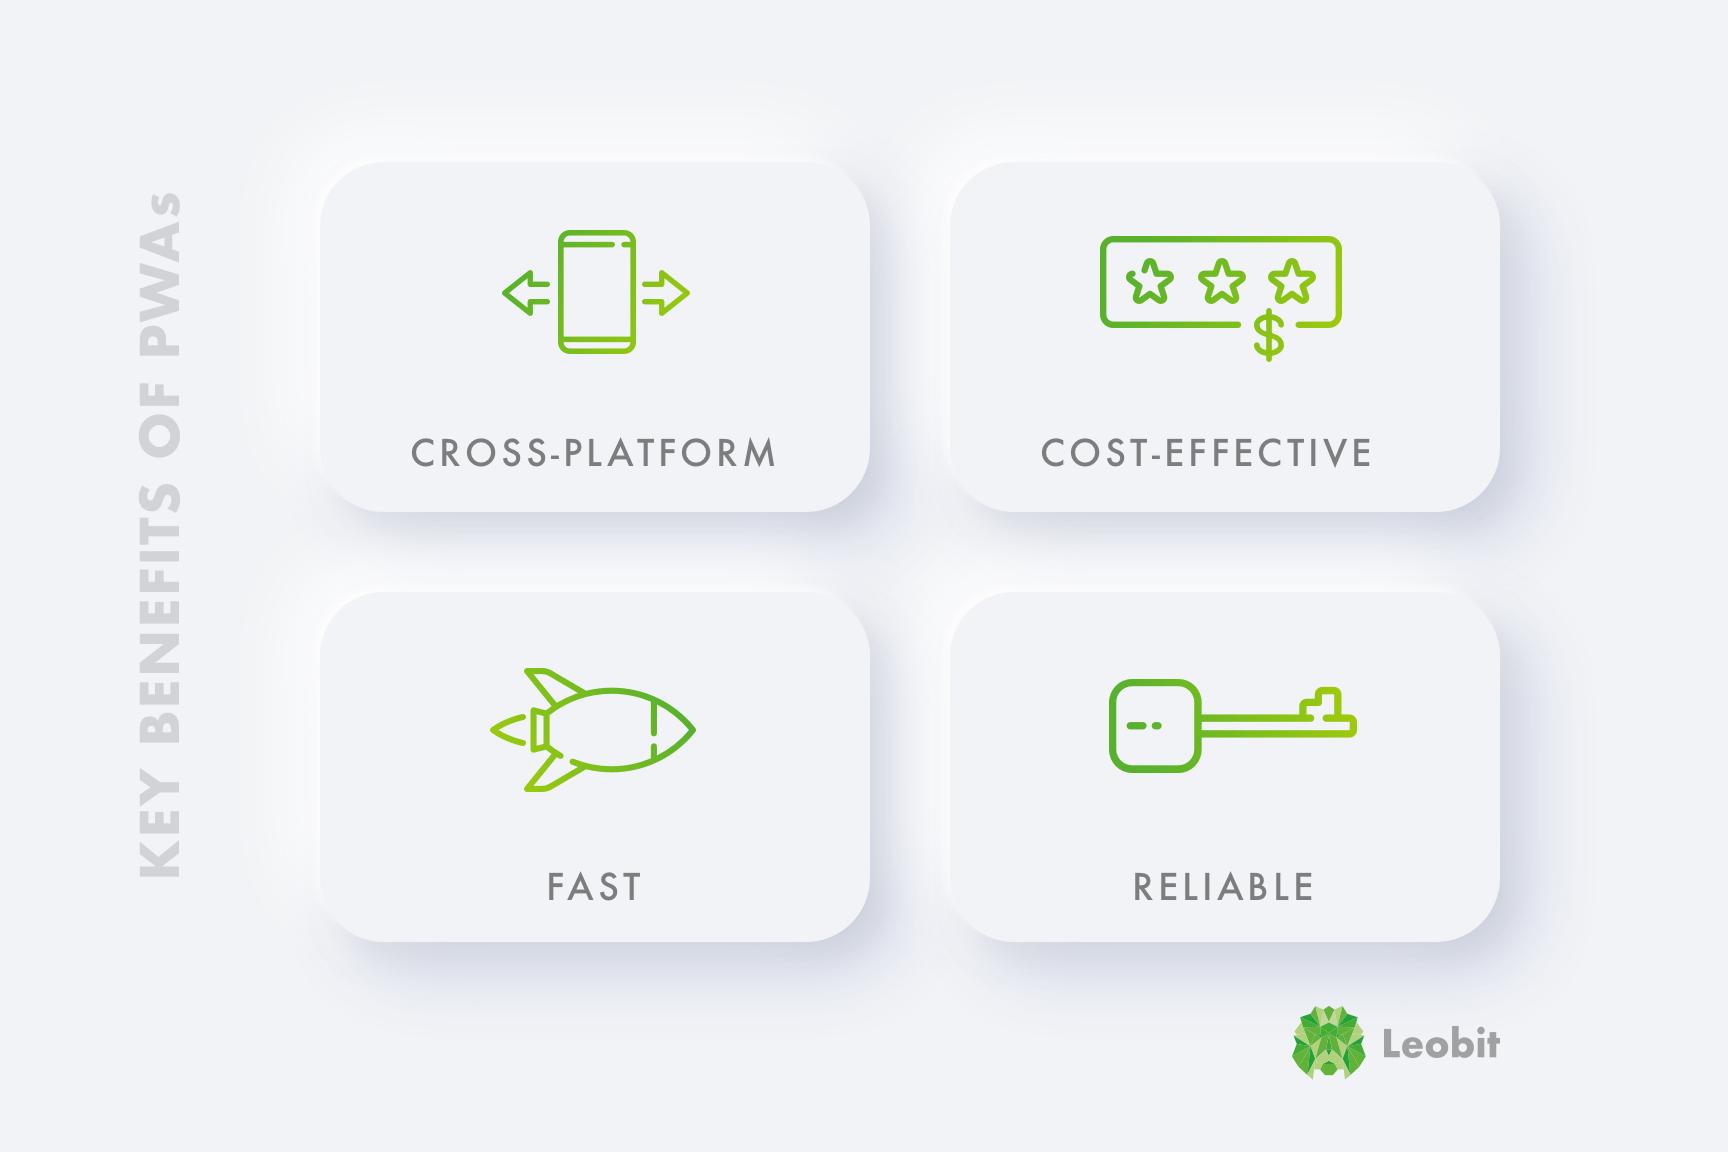 Key benefits of progressive web apps